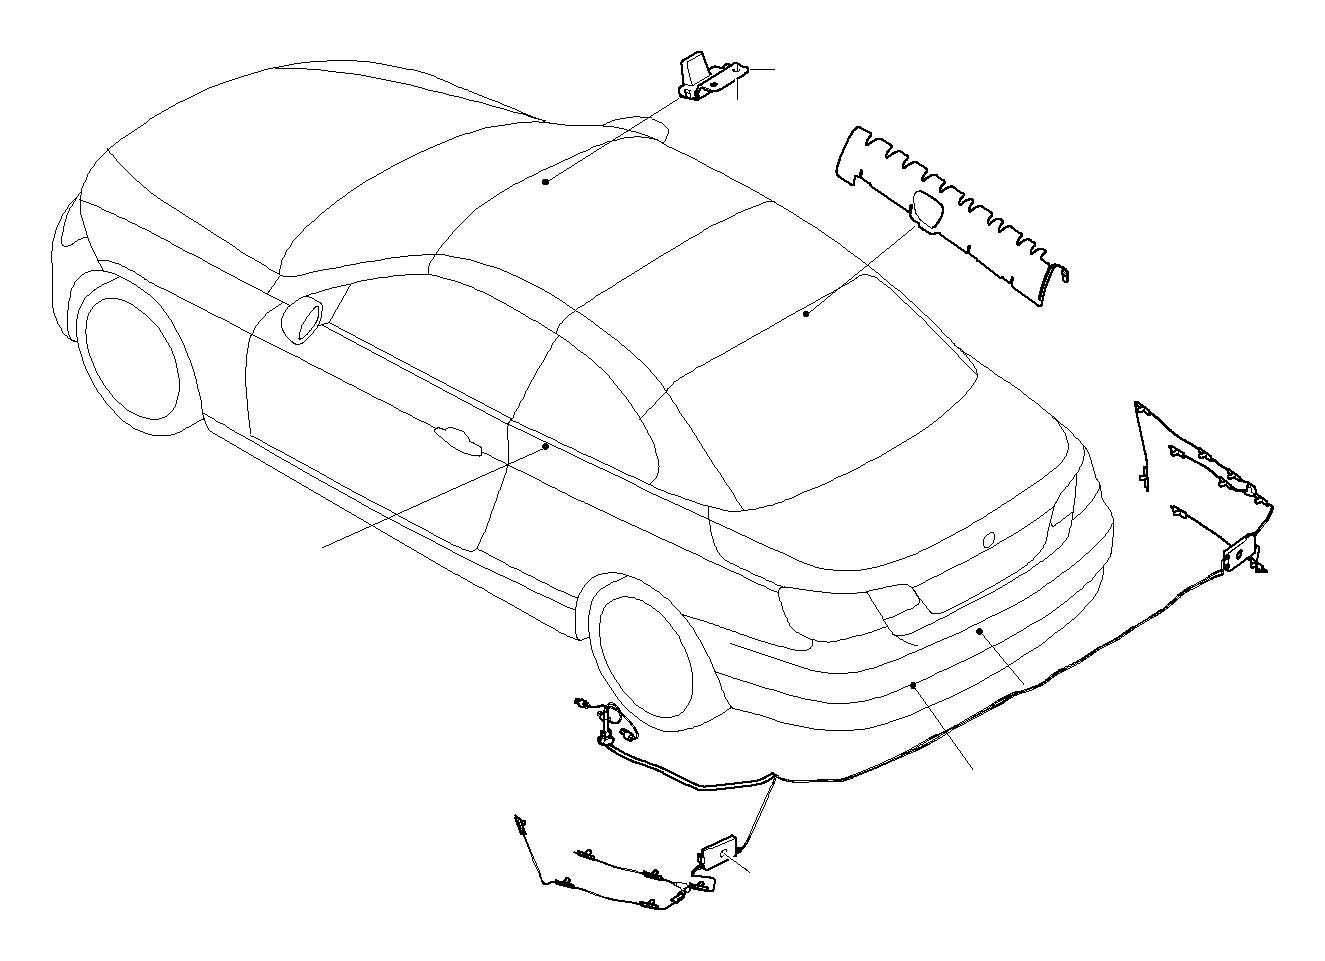 BMW M3 Aerial AM/FM, right. Trim, Antenna, Lateral